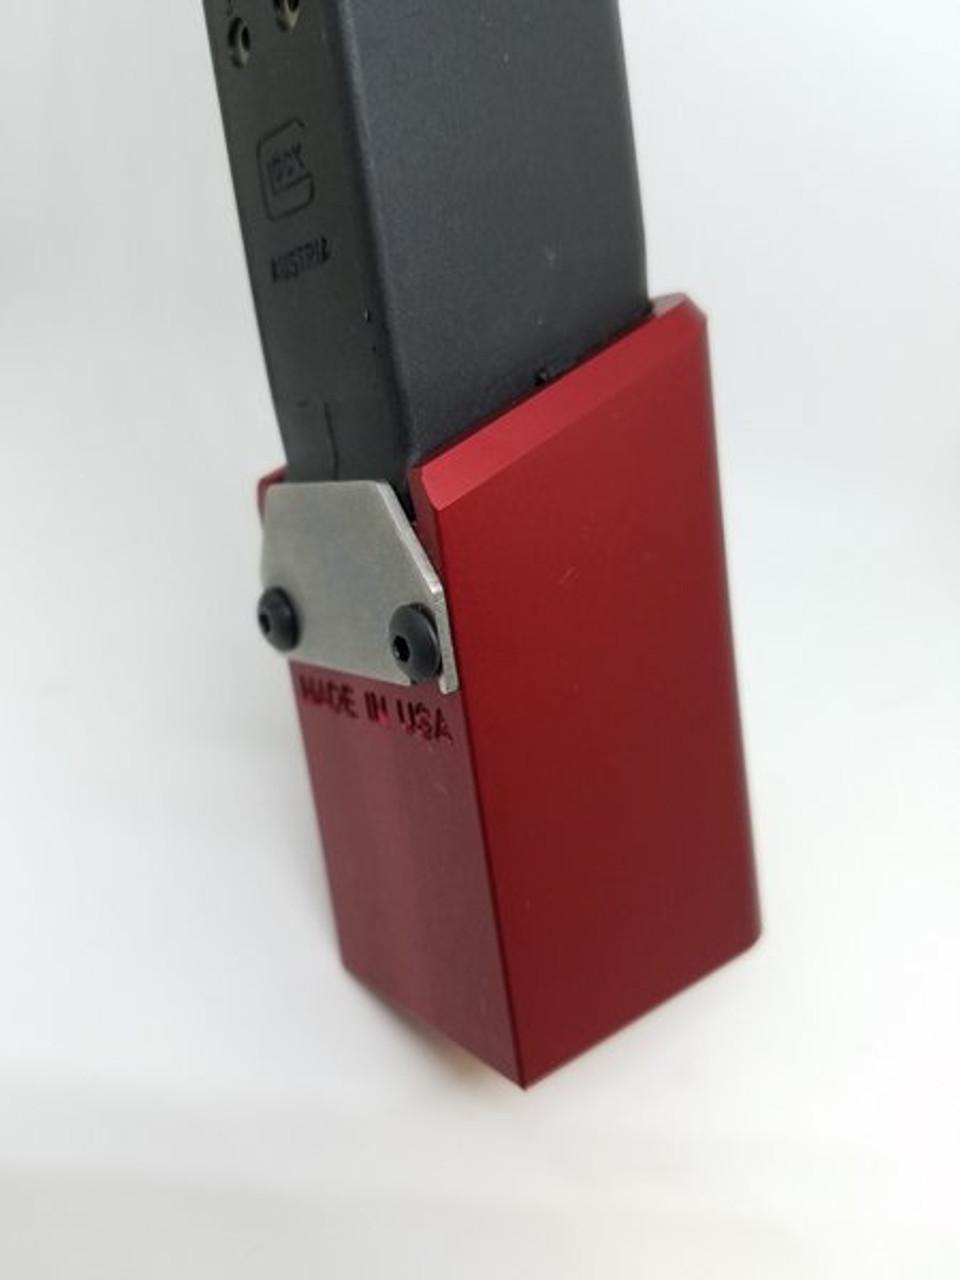 Glock 41 +1 - Red w/spring